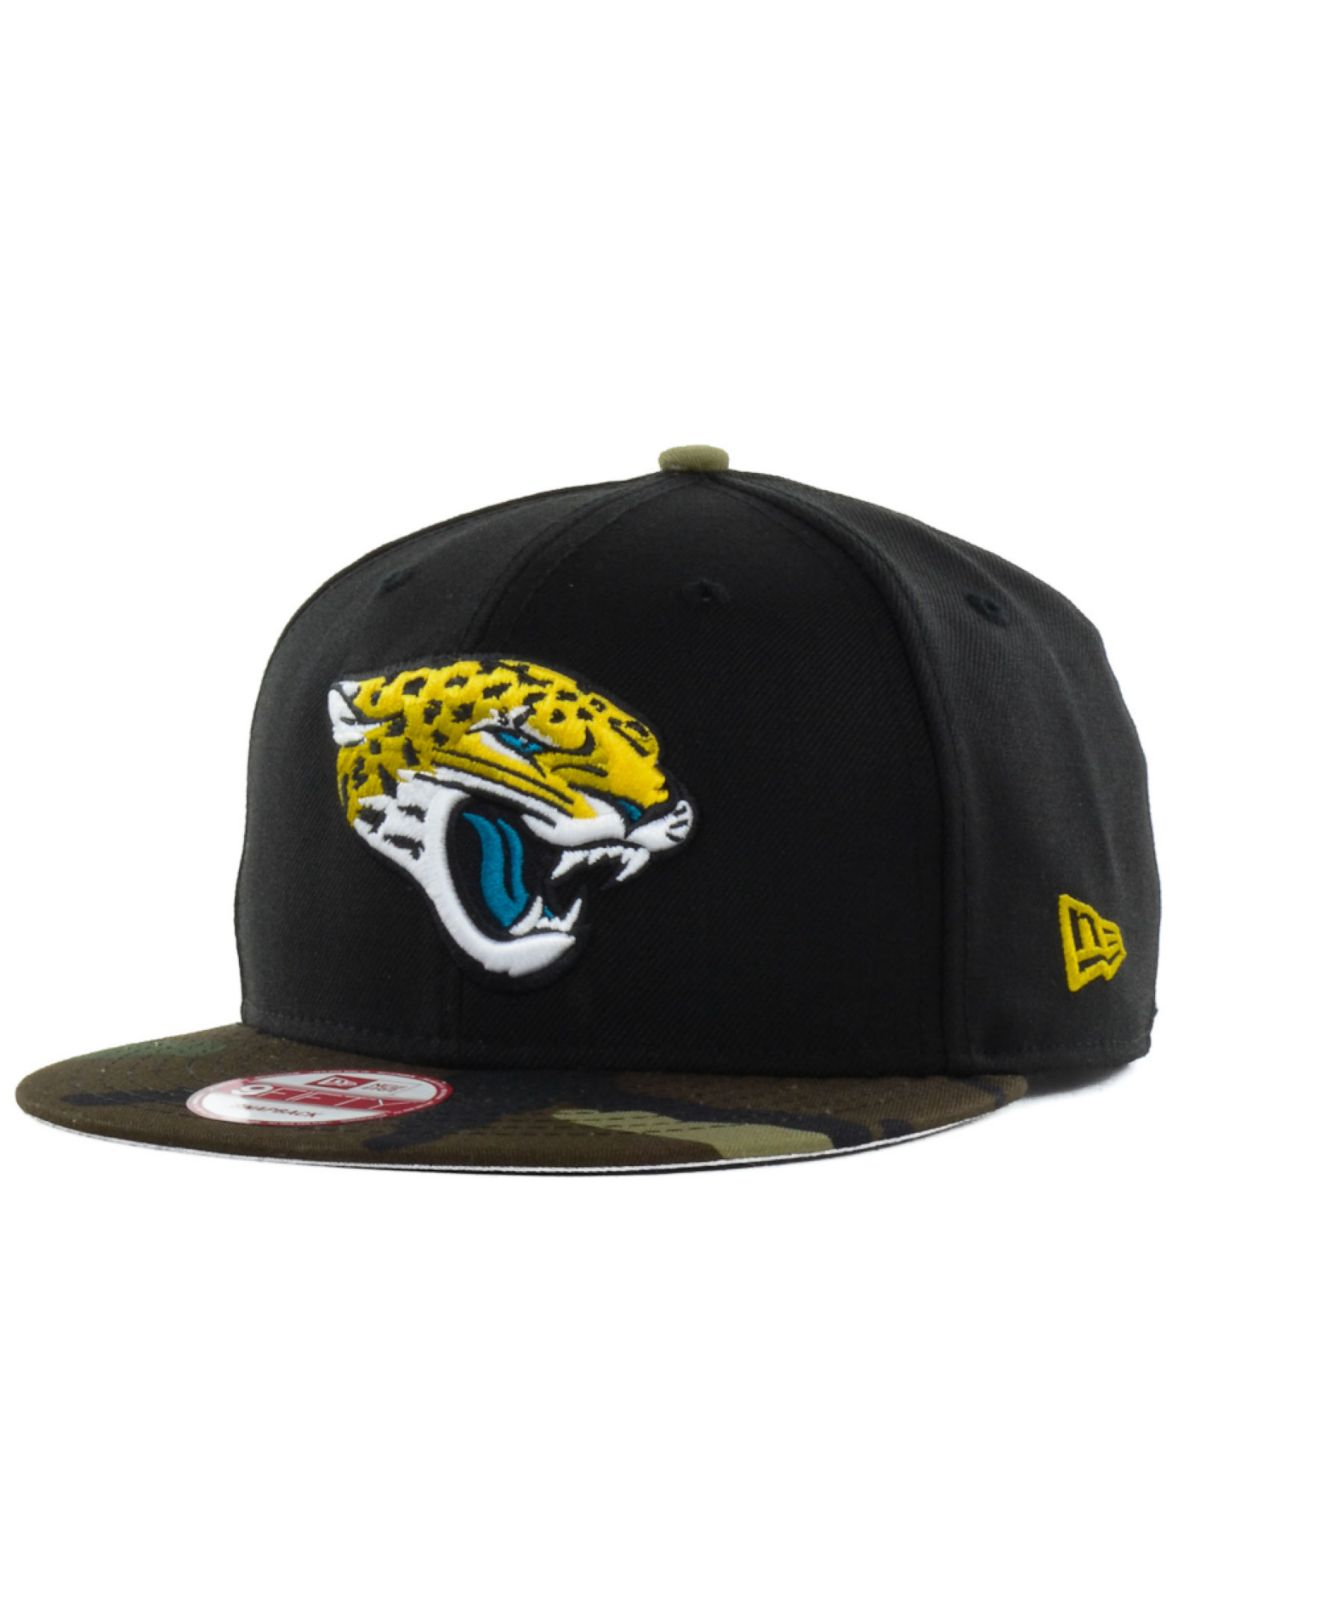 best website 8b779 2c0ec Lyst - KTZ Jacksonville Jaguars Woodland Team Color 9fifty Snapback ...